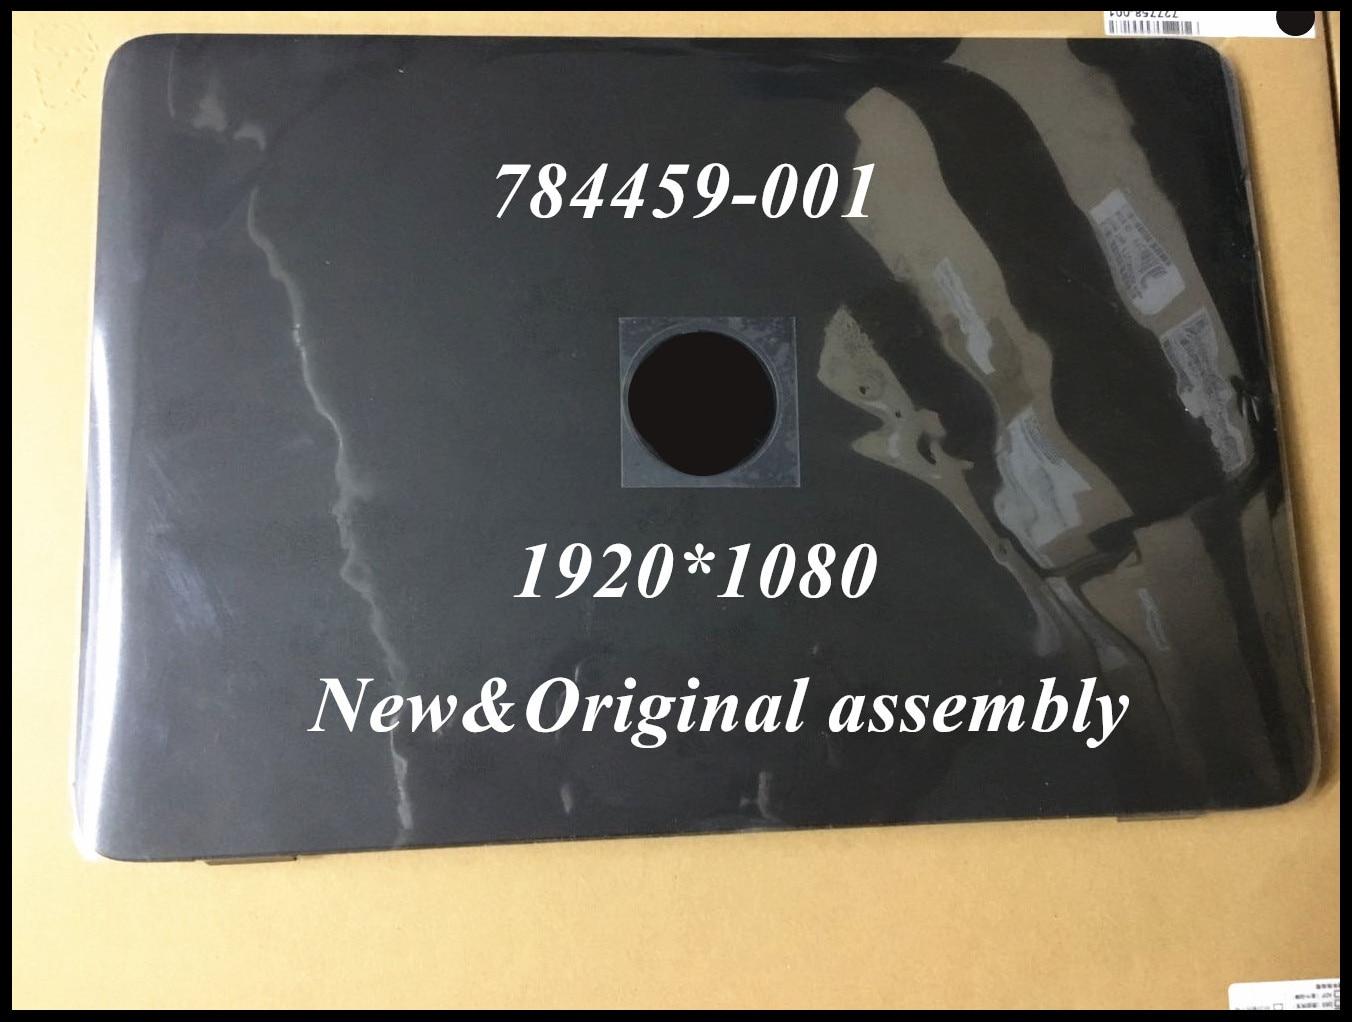 Nueva pantalla LED 784459-001 de alta calidad para HP Probook 840 G1 G2, pantalla LED con cable negro 1920*1080